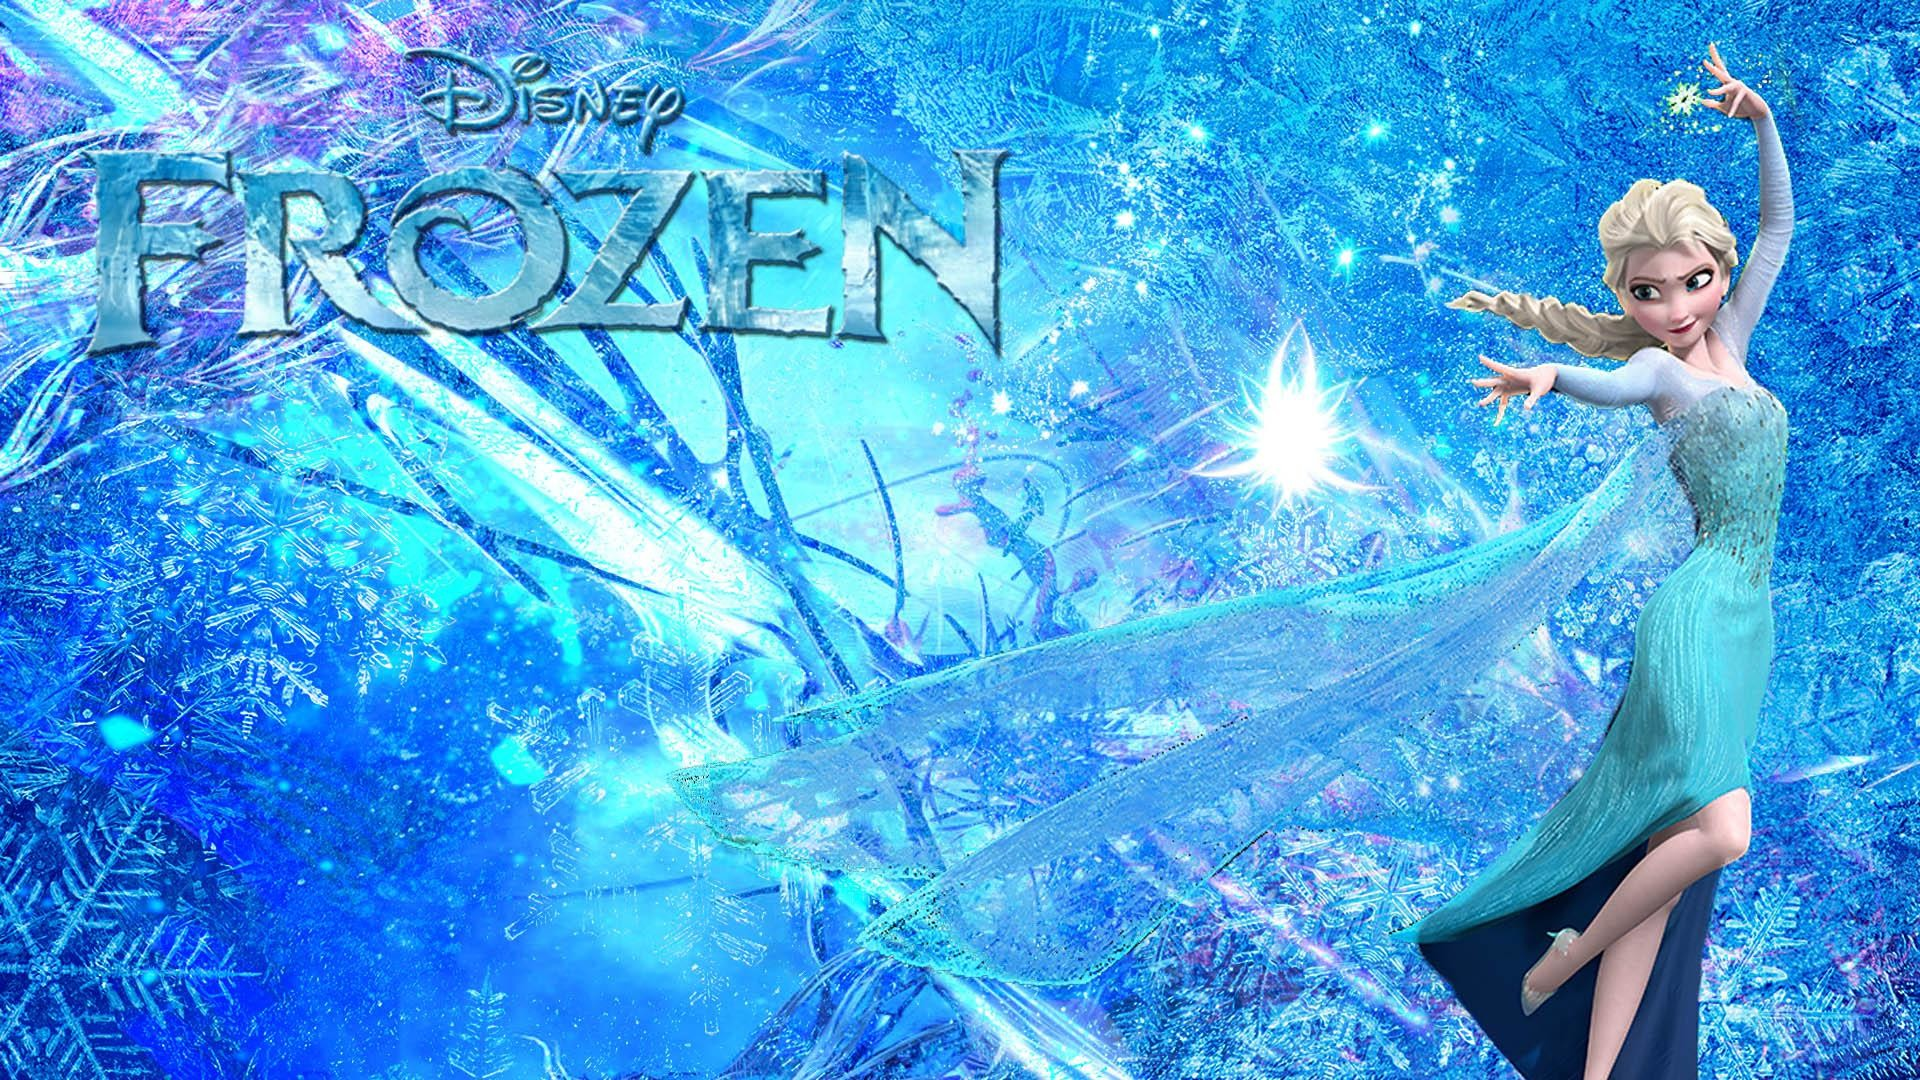 Res: 1920x1080, Elsa Frozen Wallpapers HD.